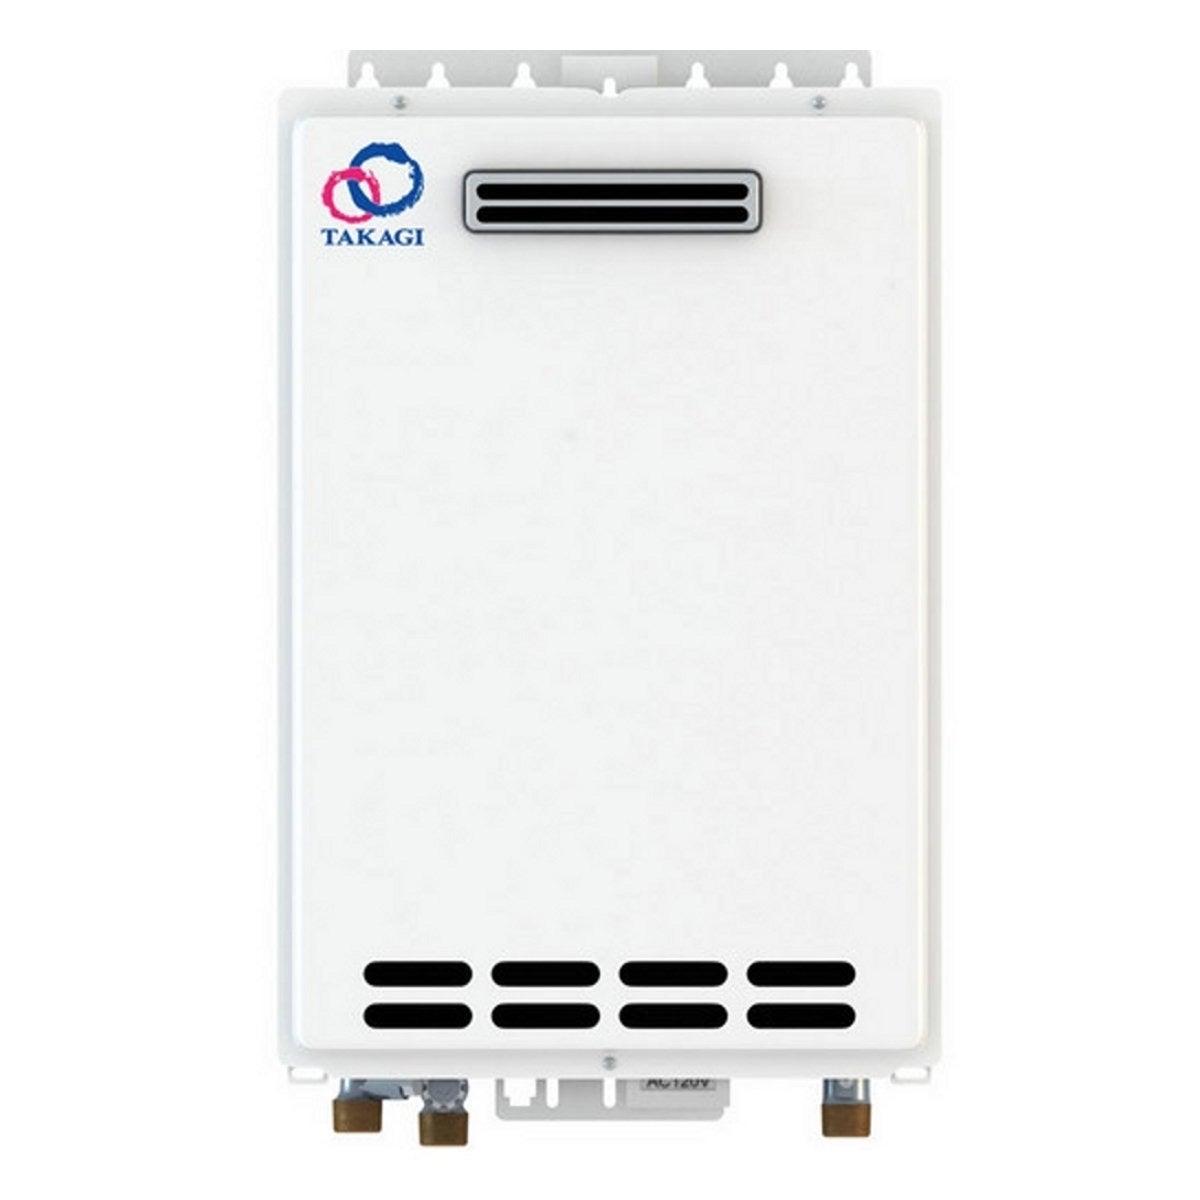 TAKAGI T-T-KJr2-OS-LP Outdoor Tankless Water Heater Propa...